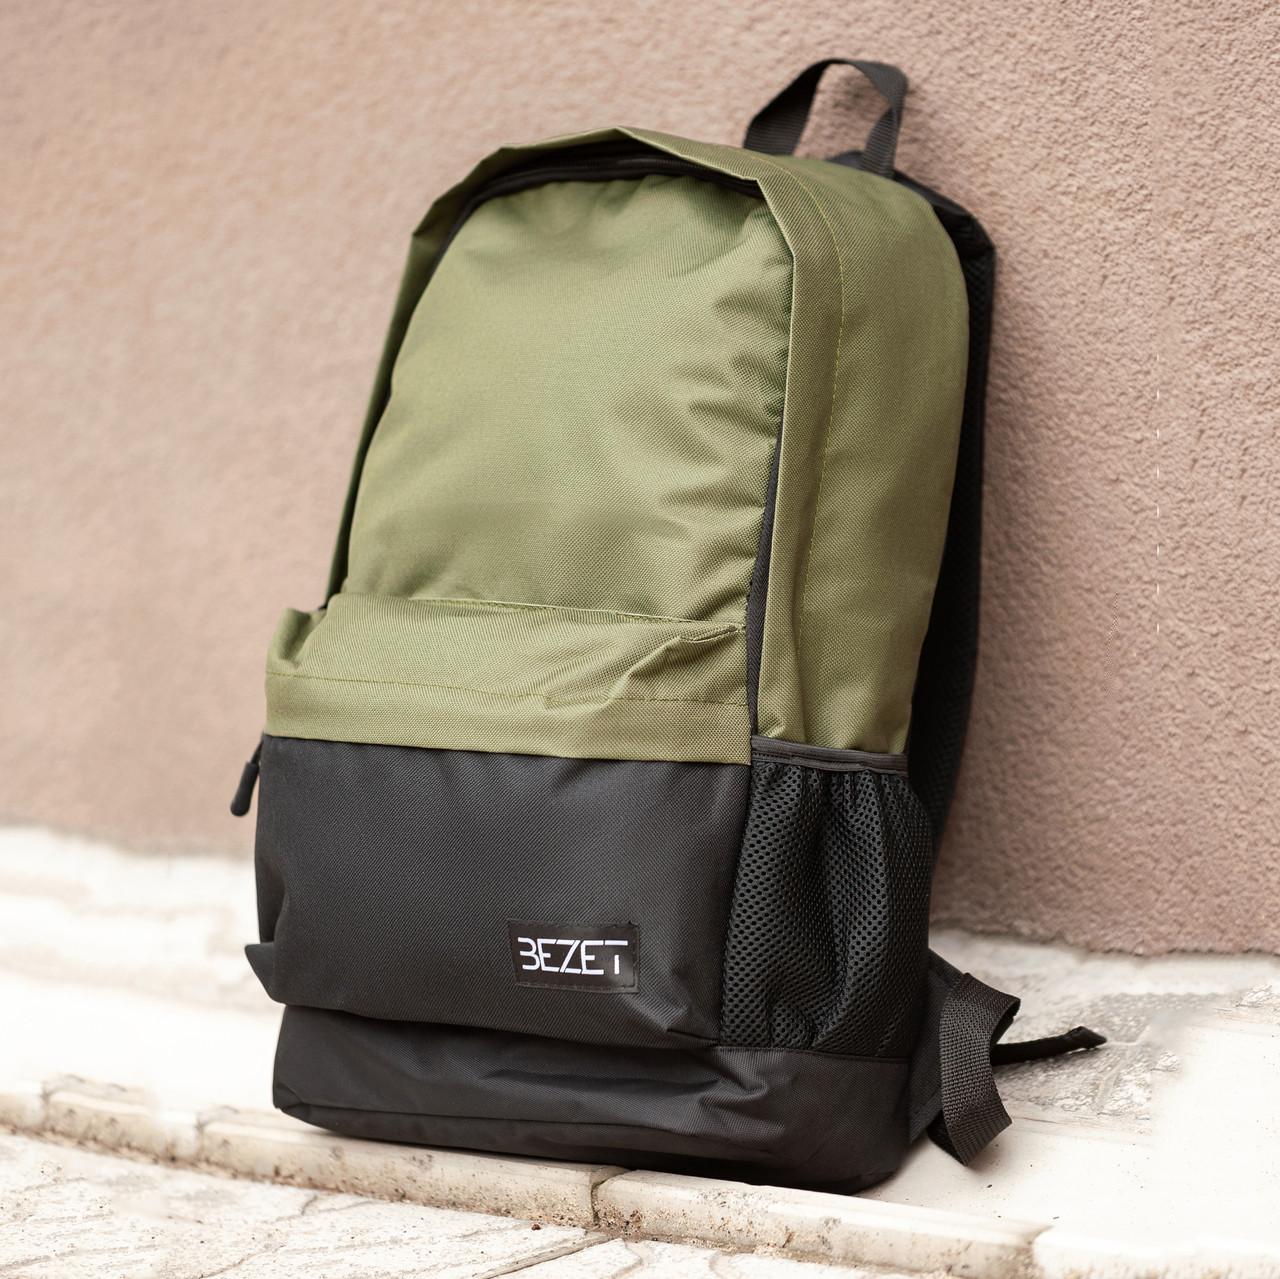 Рюкзак BeZet BLACK/KHAKI